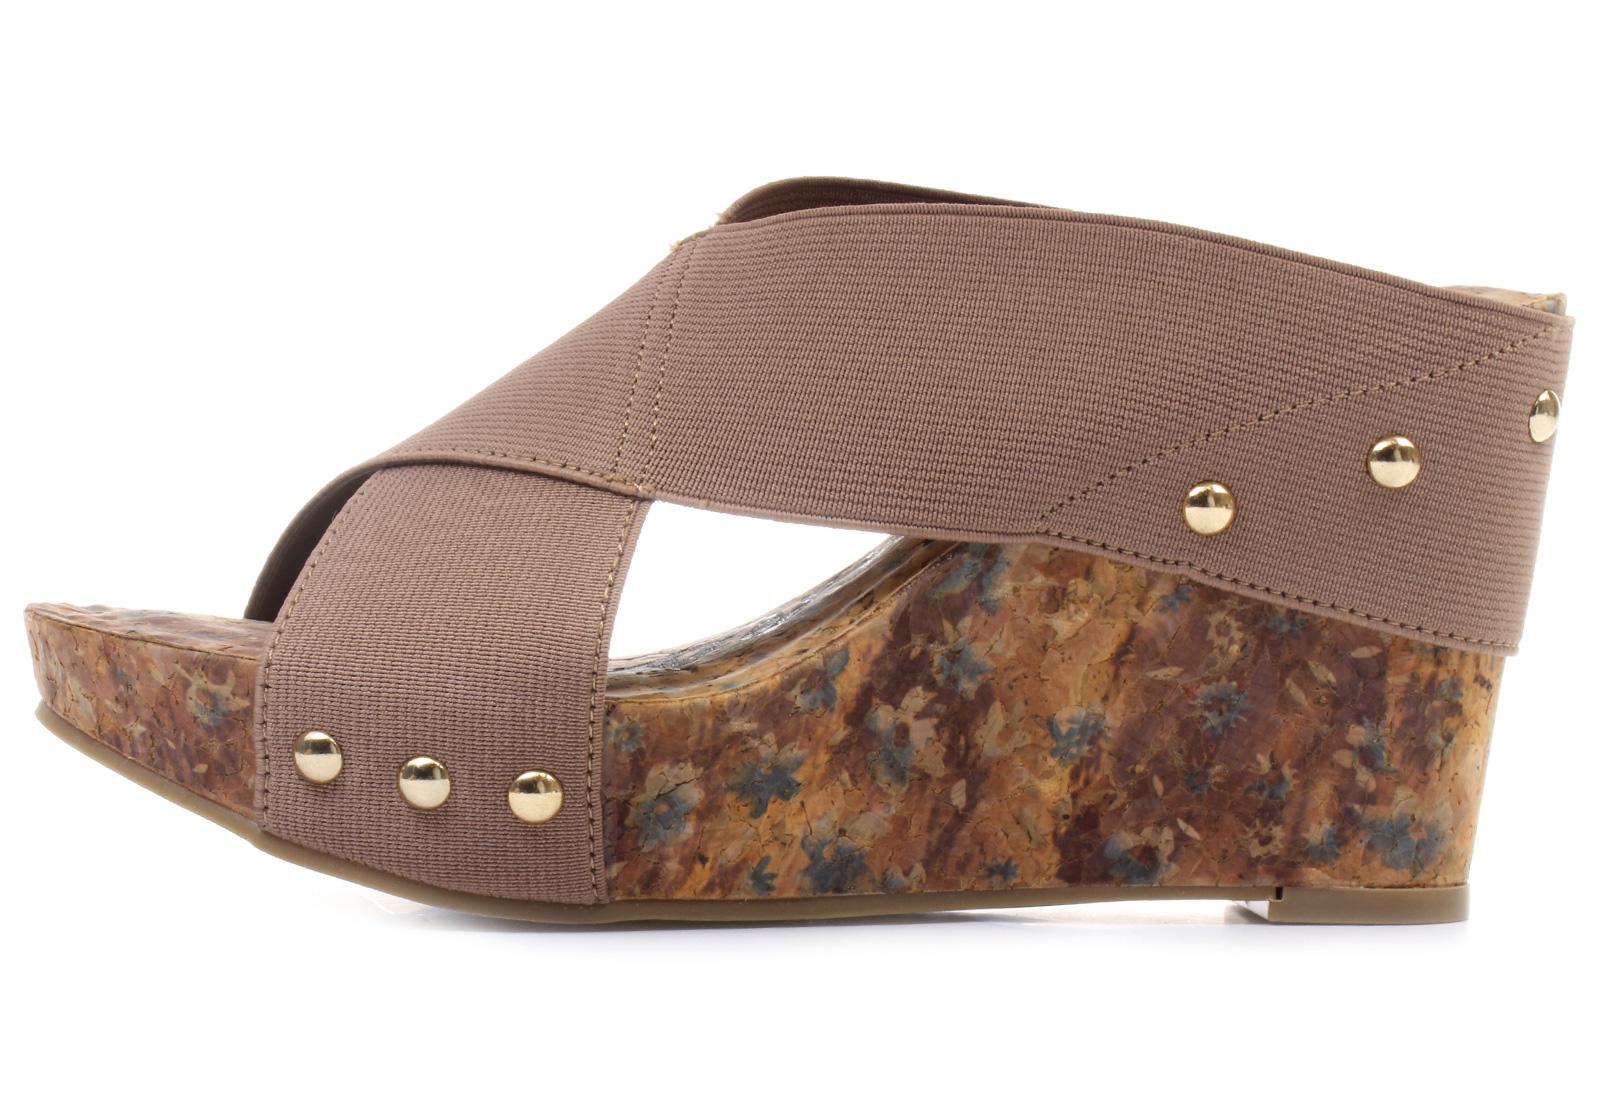 beaed0135e0e Skechers Papucs - Wink - 38328-brn - Office Shoes Magyarország